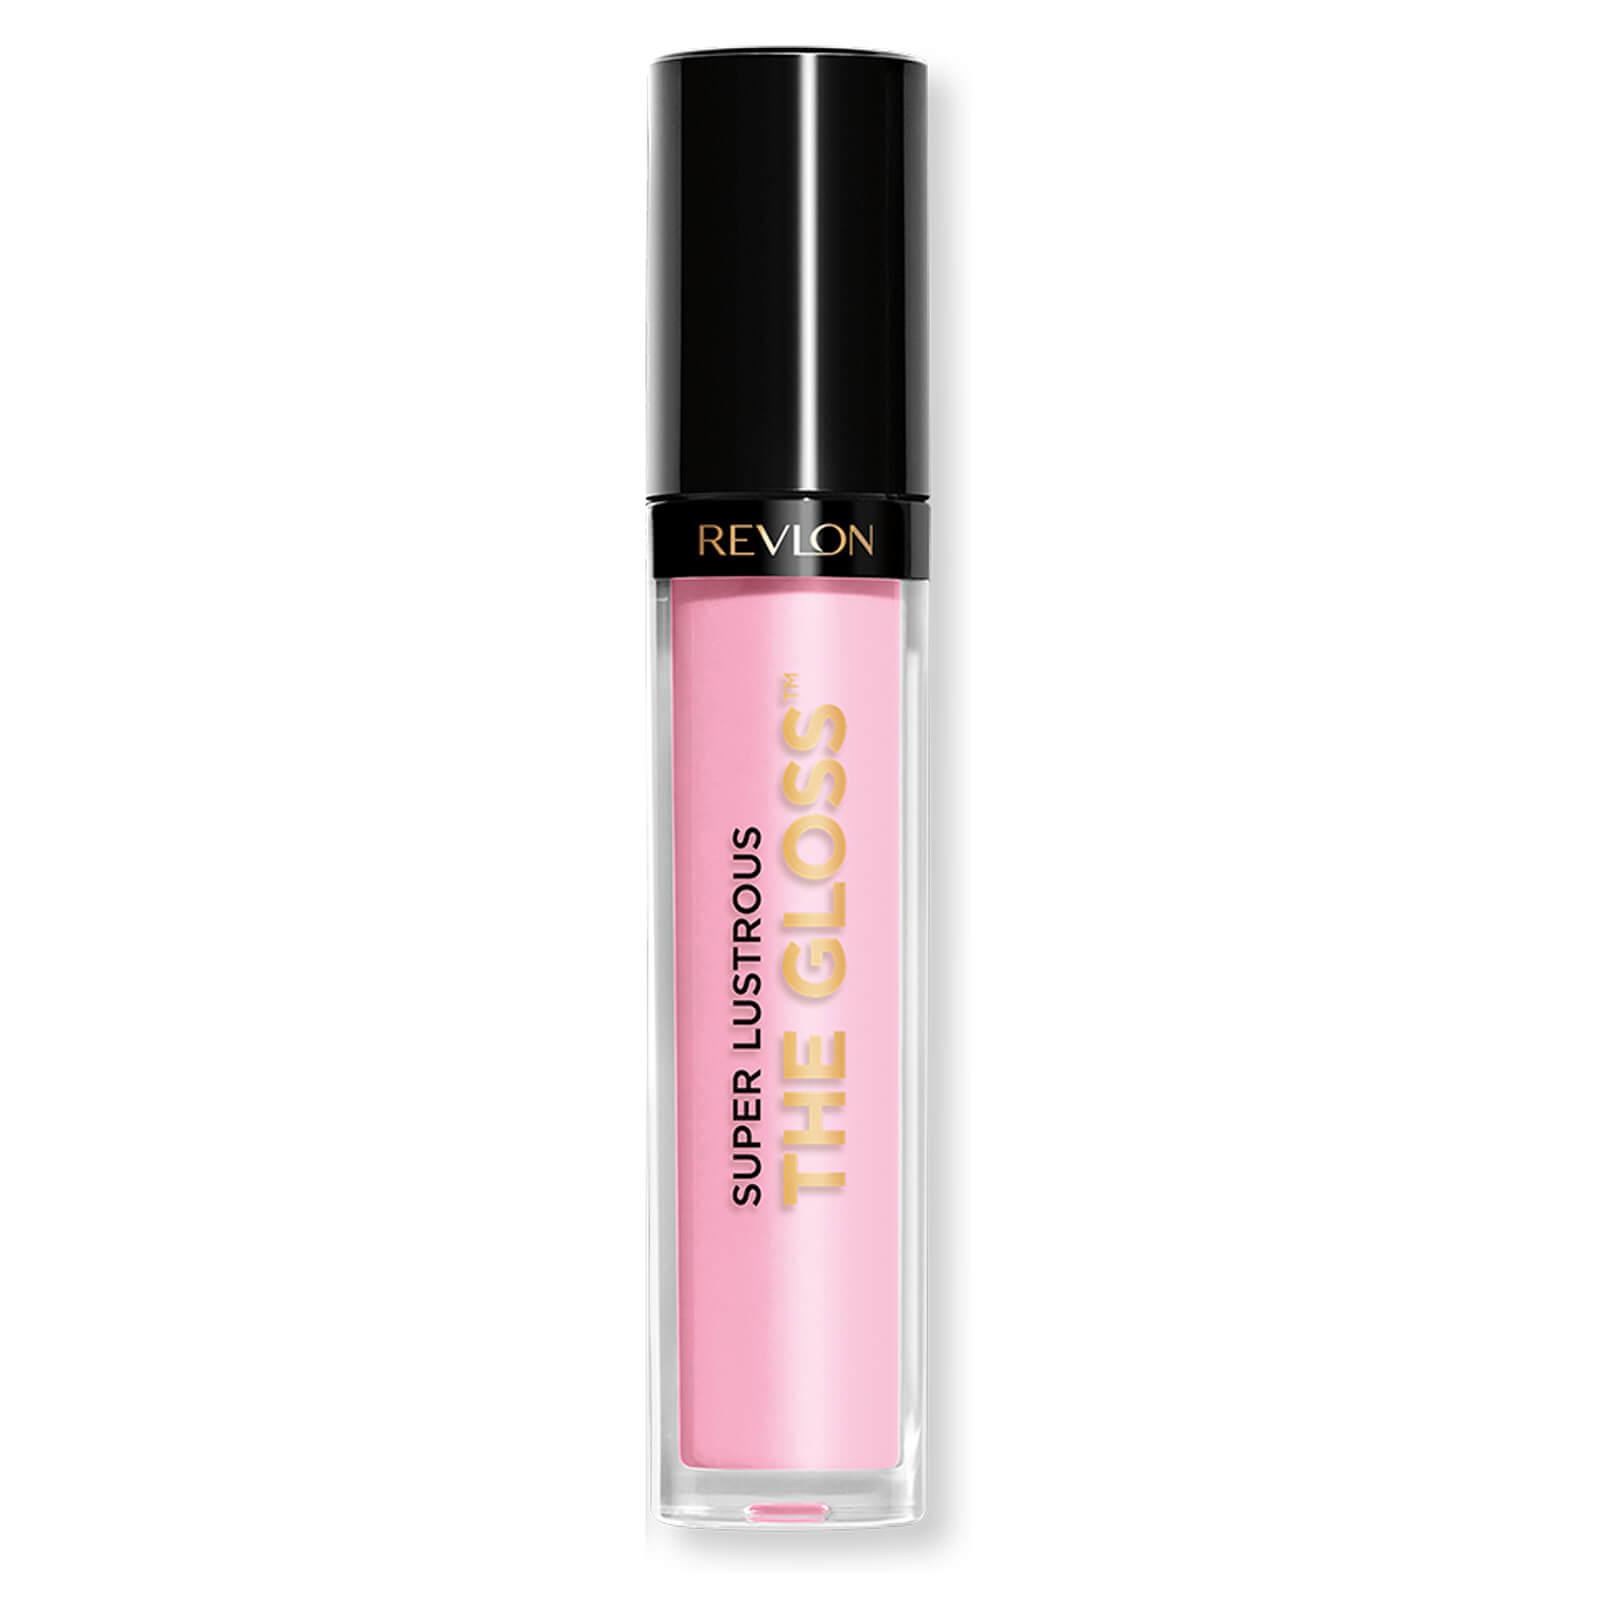 Купить Revlon Super Lustrous The Gloss (Various Shades) - Sky Pink